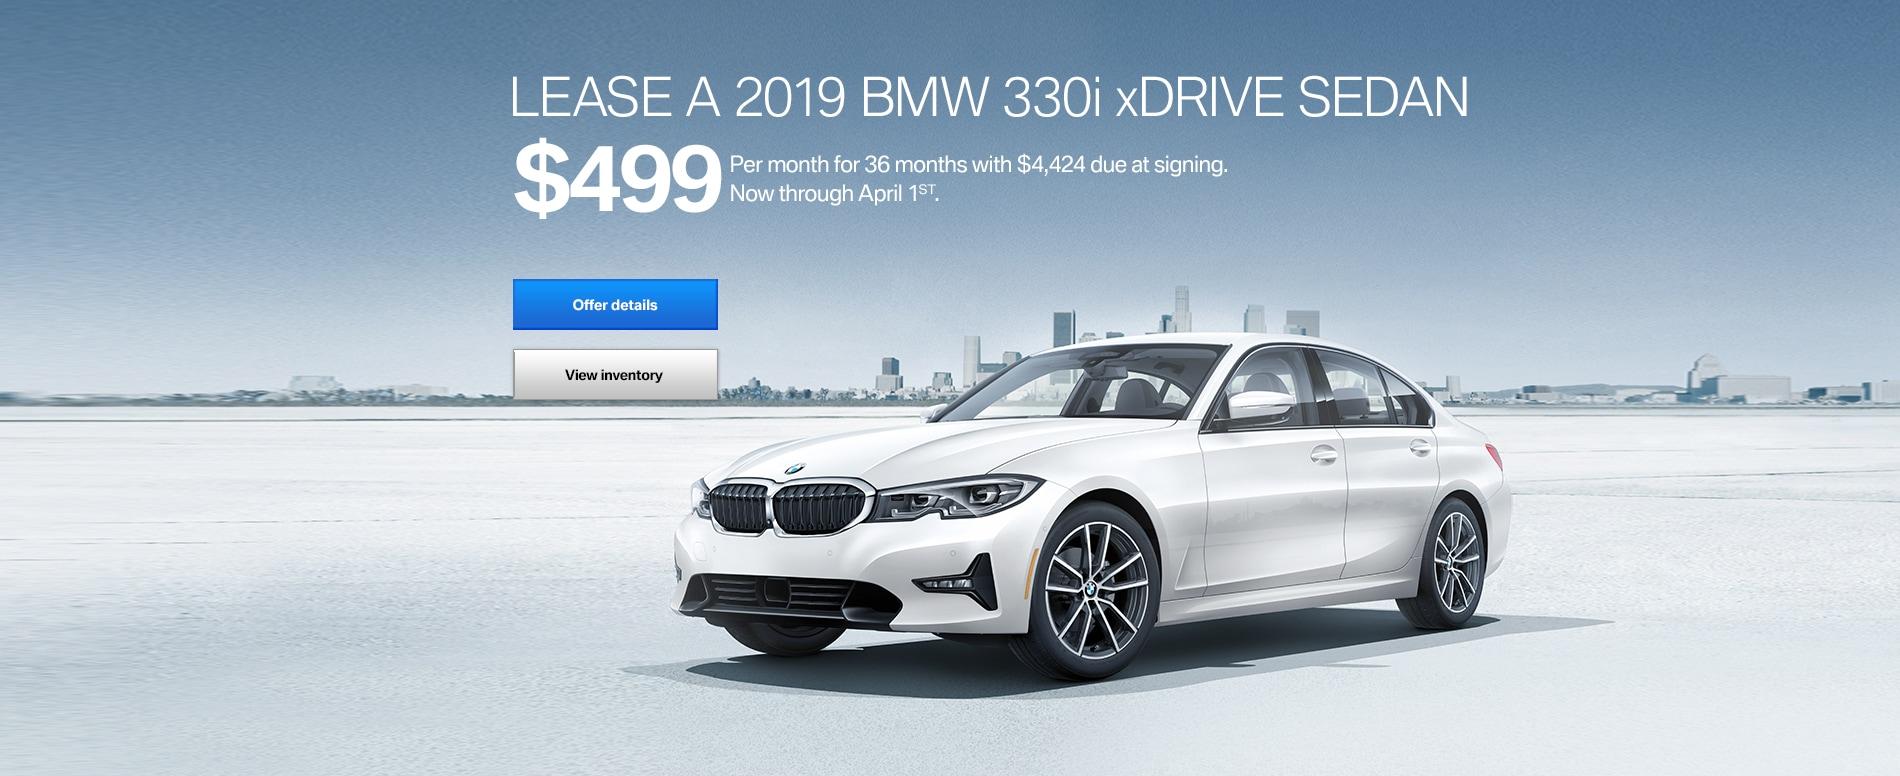 Bmw Of Milwaukee North Luxury Car Dealership In Glendale Wi